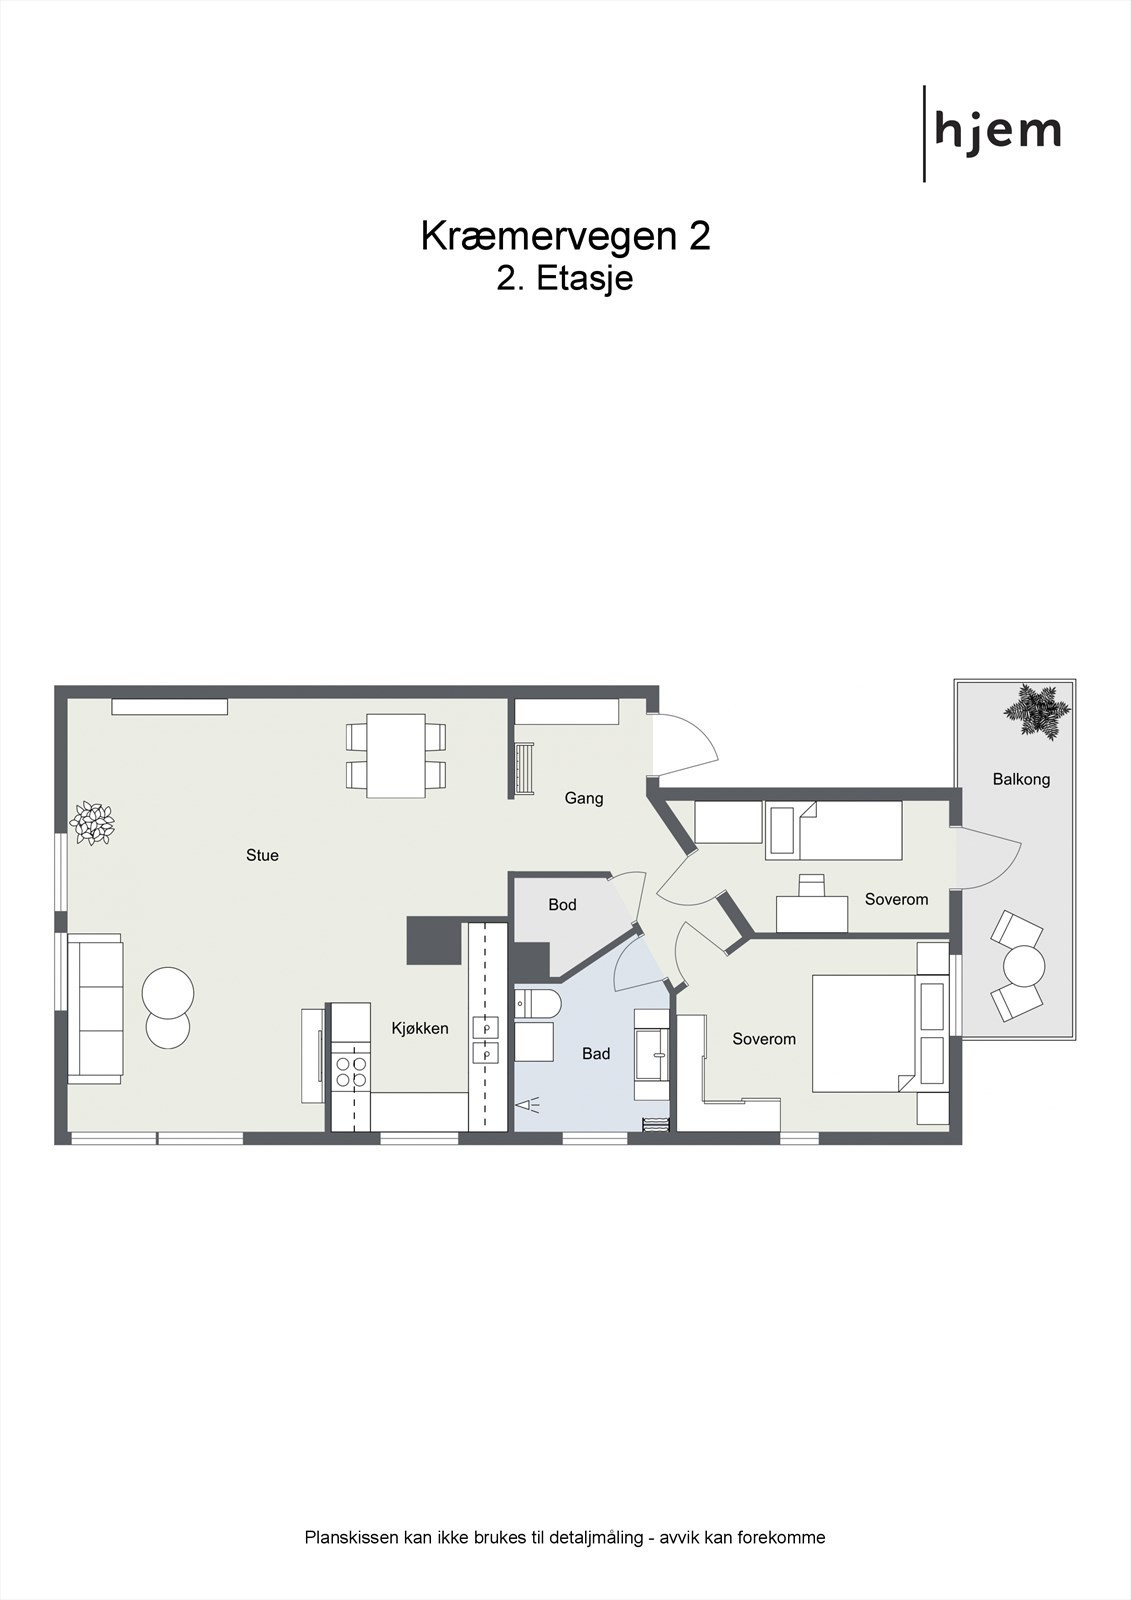 Floorplan letterhead - Kræmervegen 2 - 2. Etasje - 2D Floor Plan.jpg